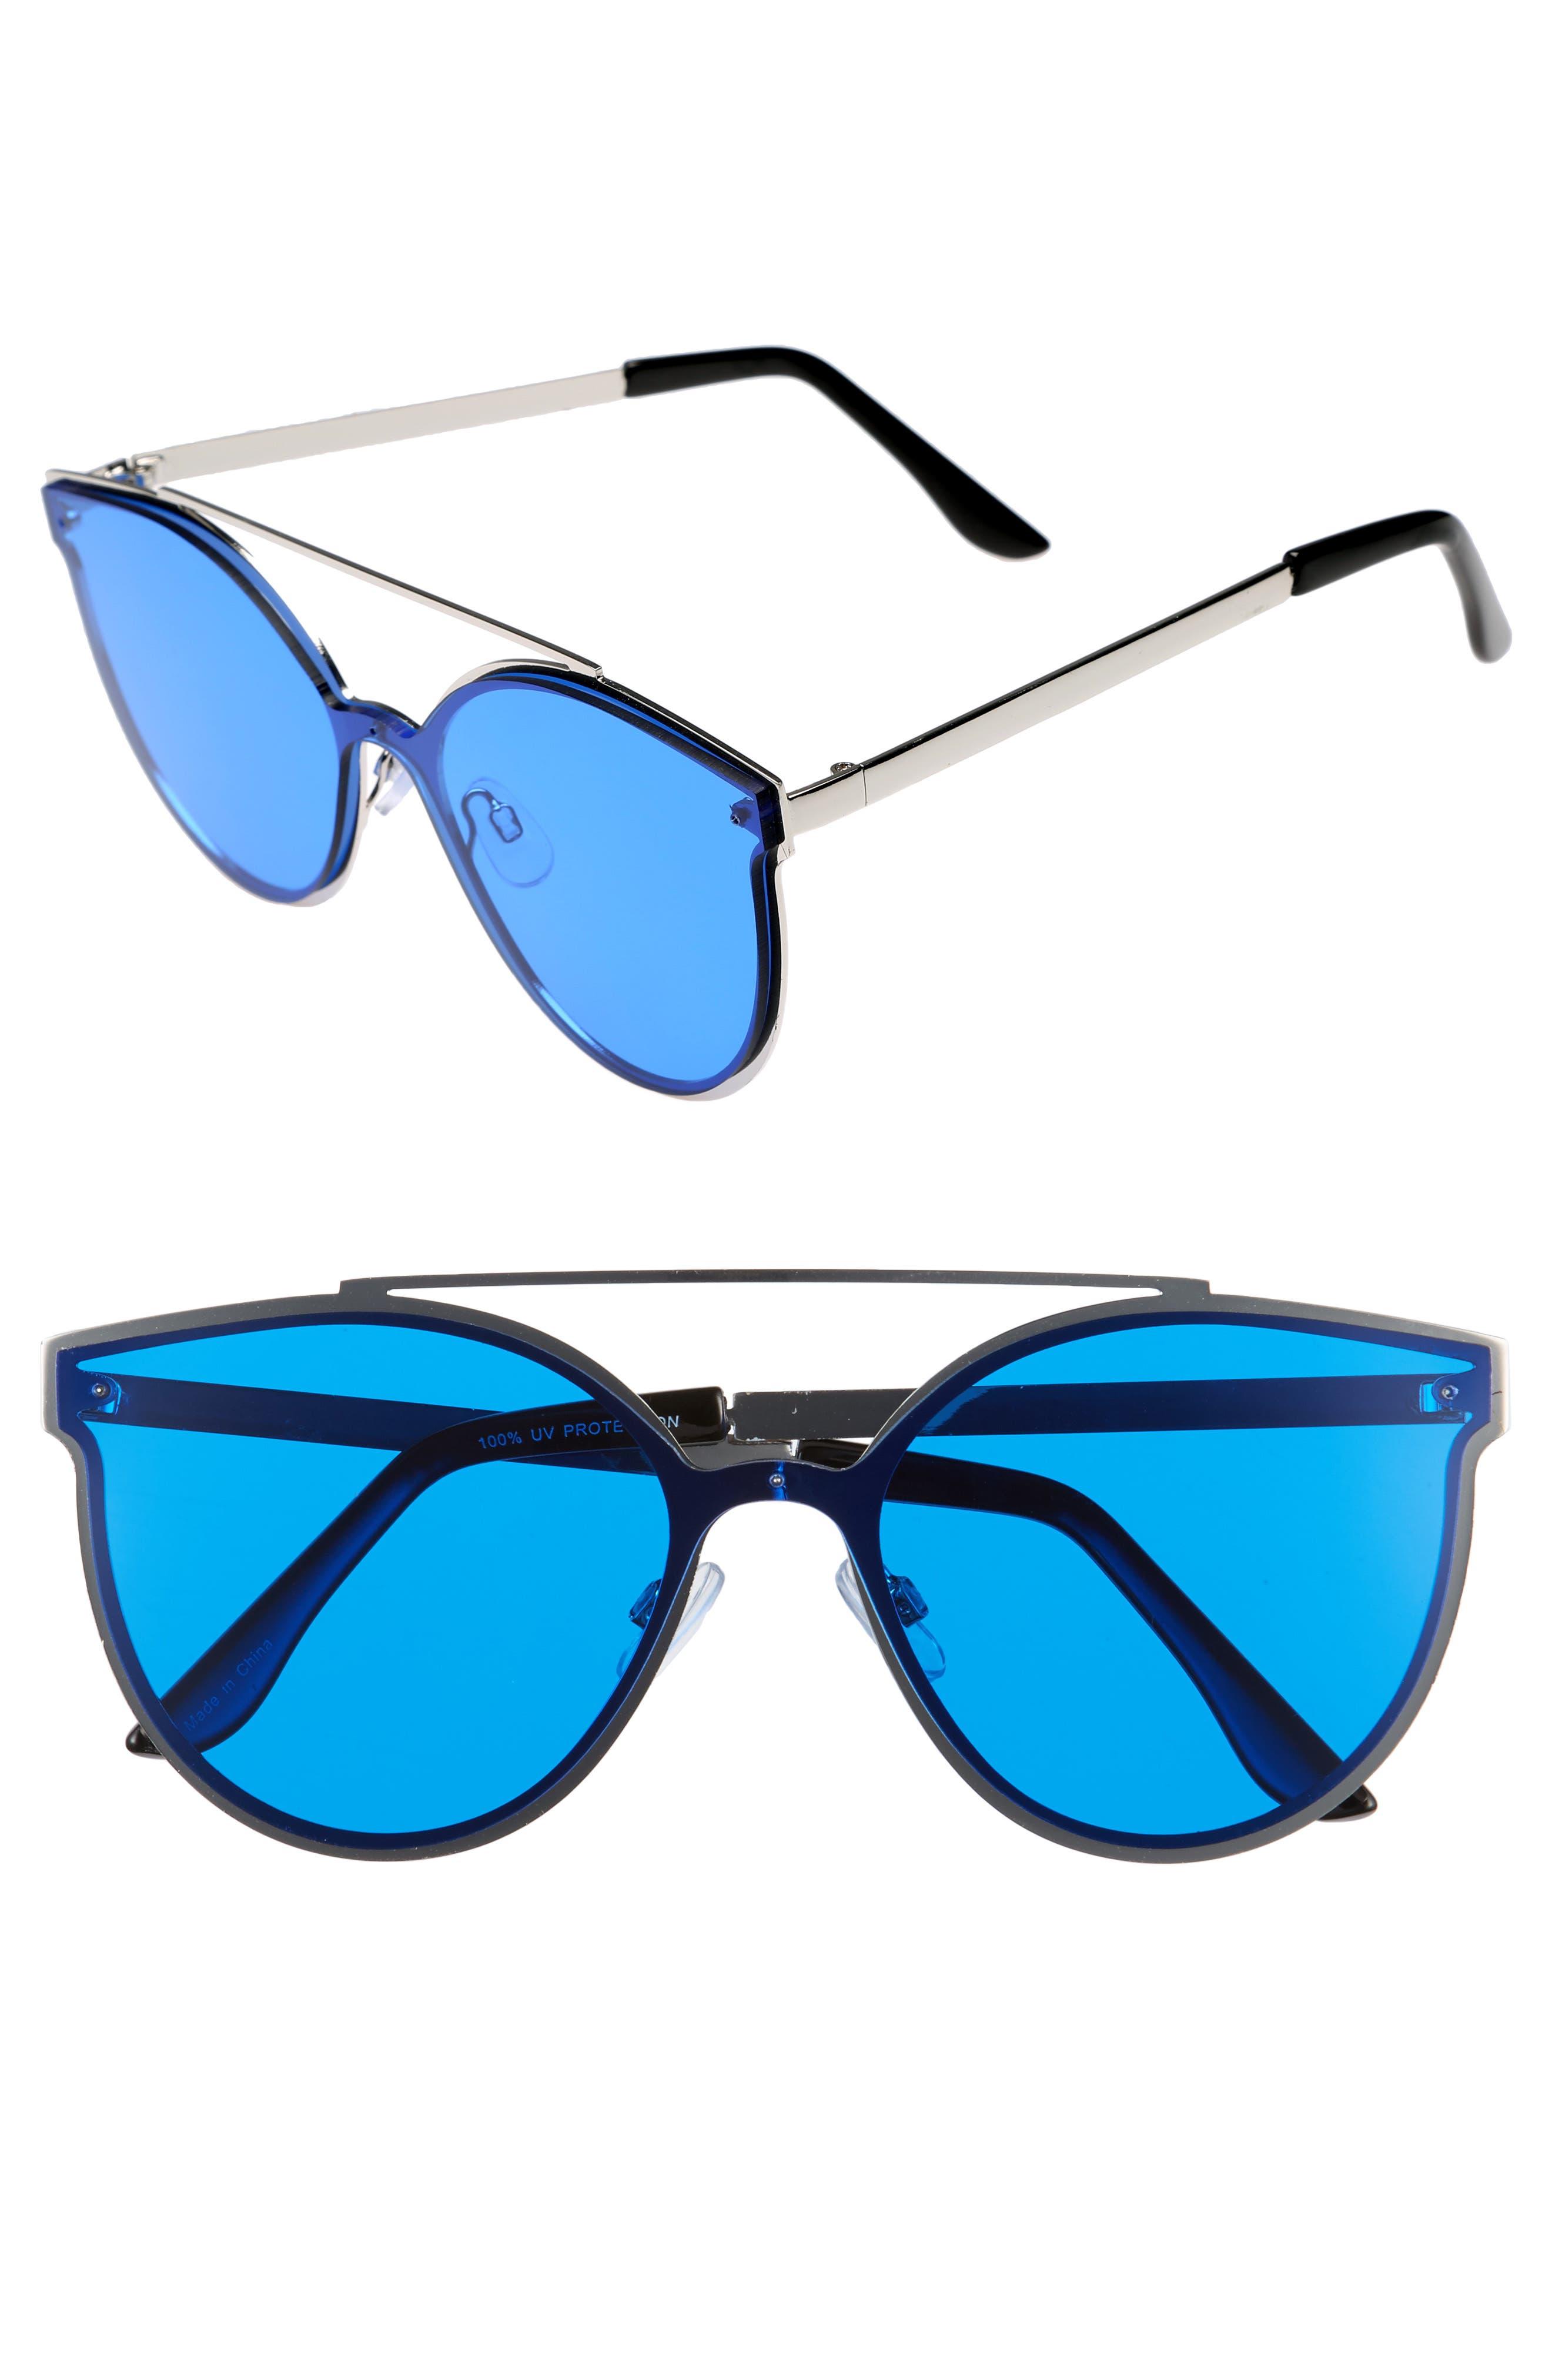 58mm Brow Bar Sunglasses,                         Main,                         color, 400